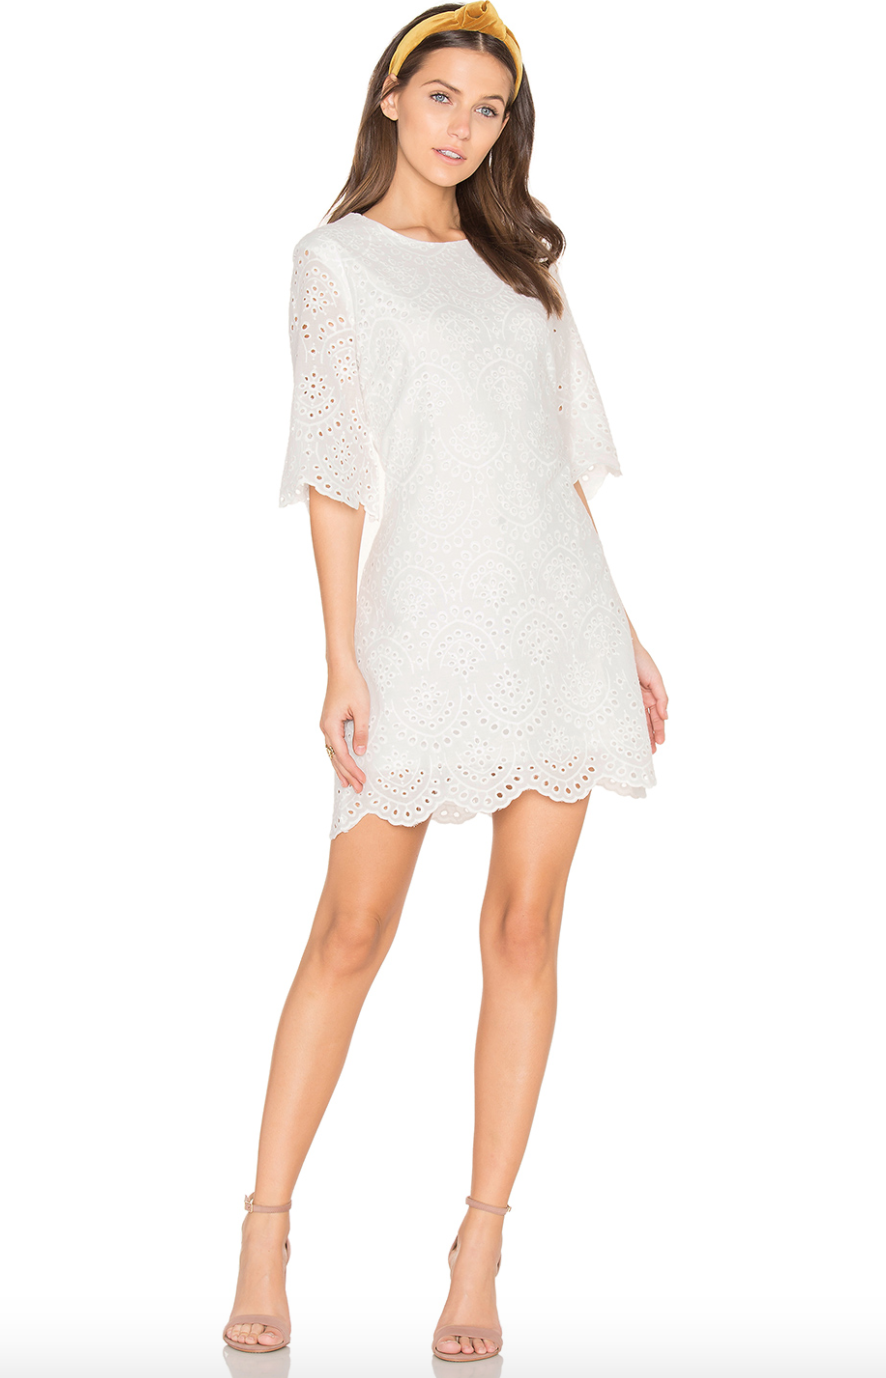 BIshop + Young scalloped mini dress $124